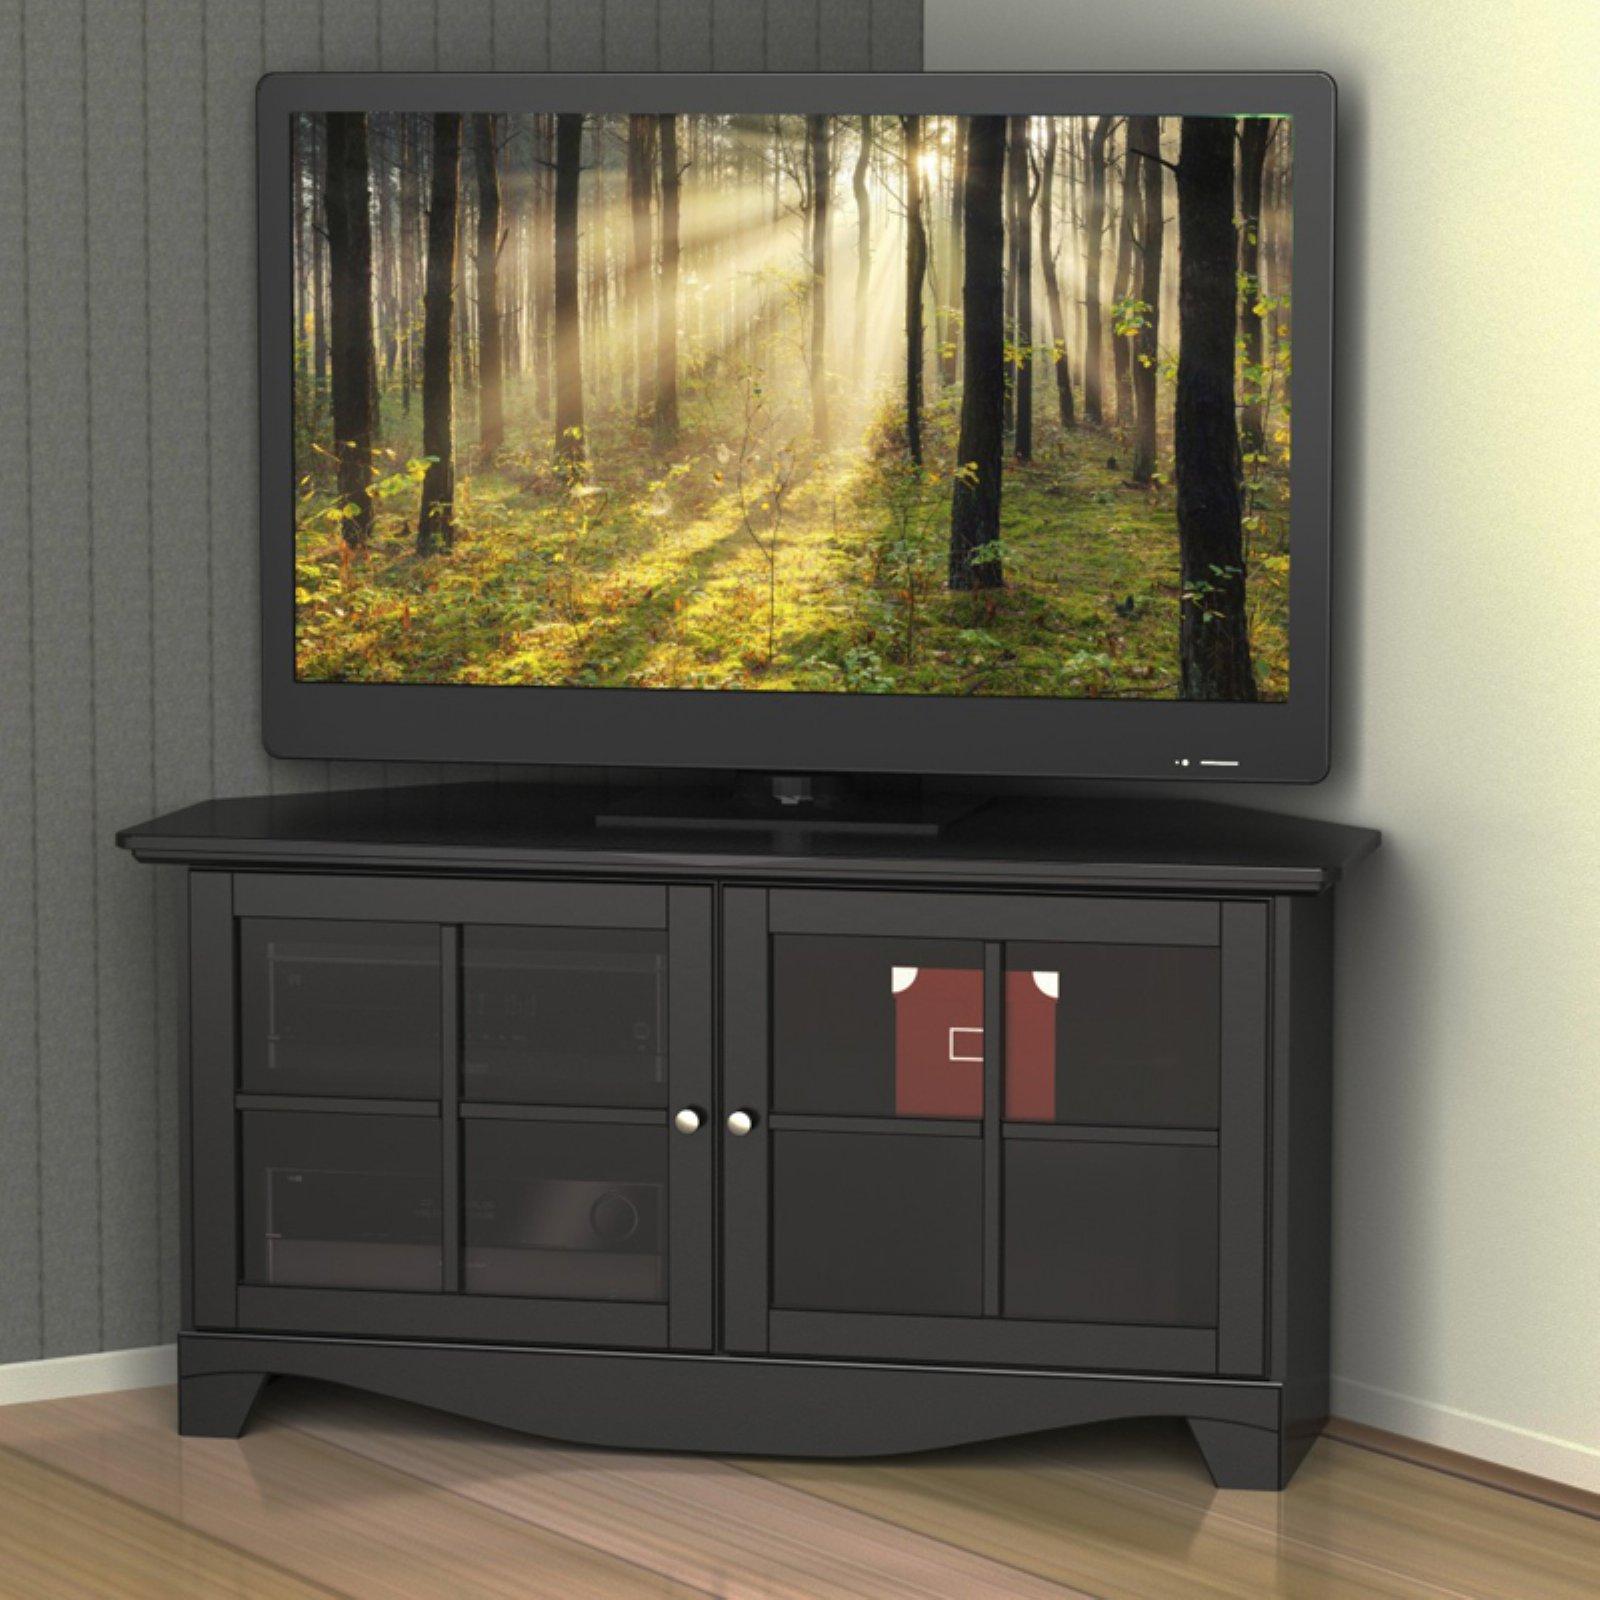 Nexera Pinnacle Black 2 Door Corner Tv Stand For Tvs Up To 49